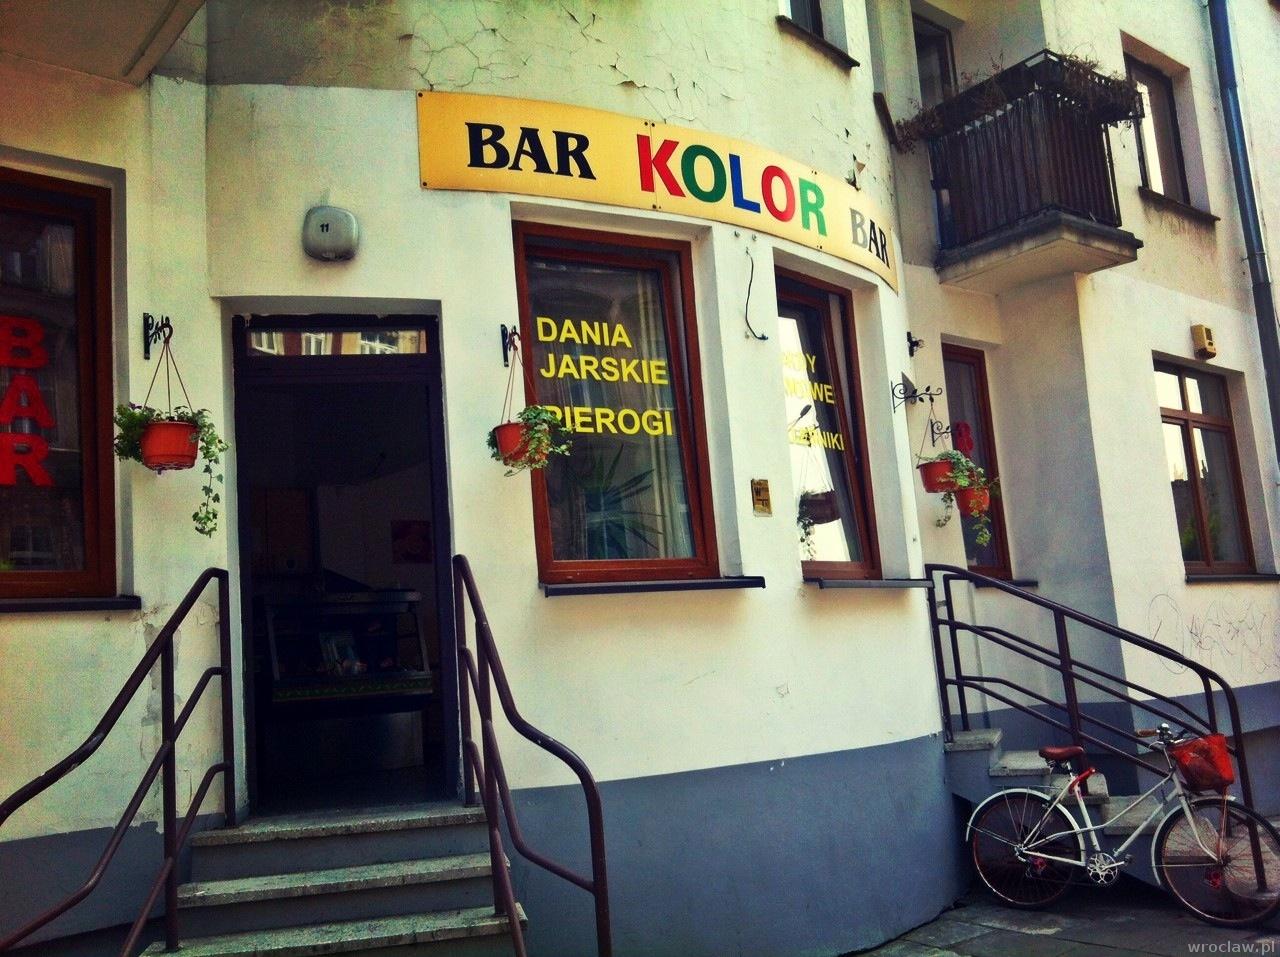 Bar Kolor